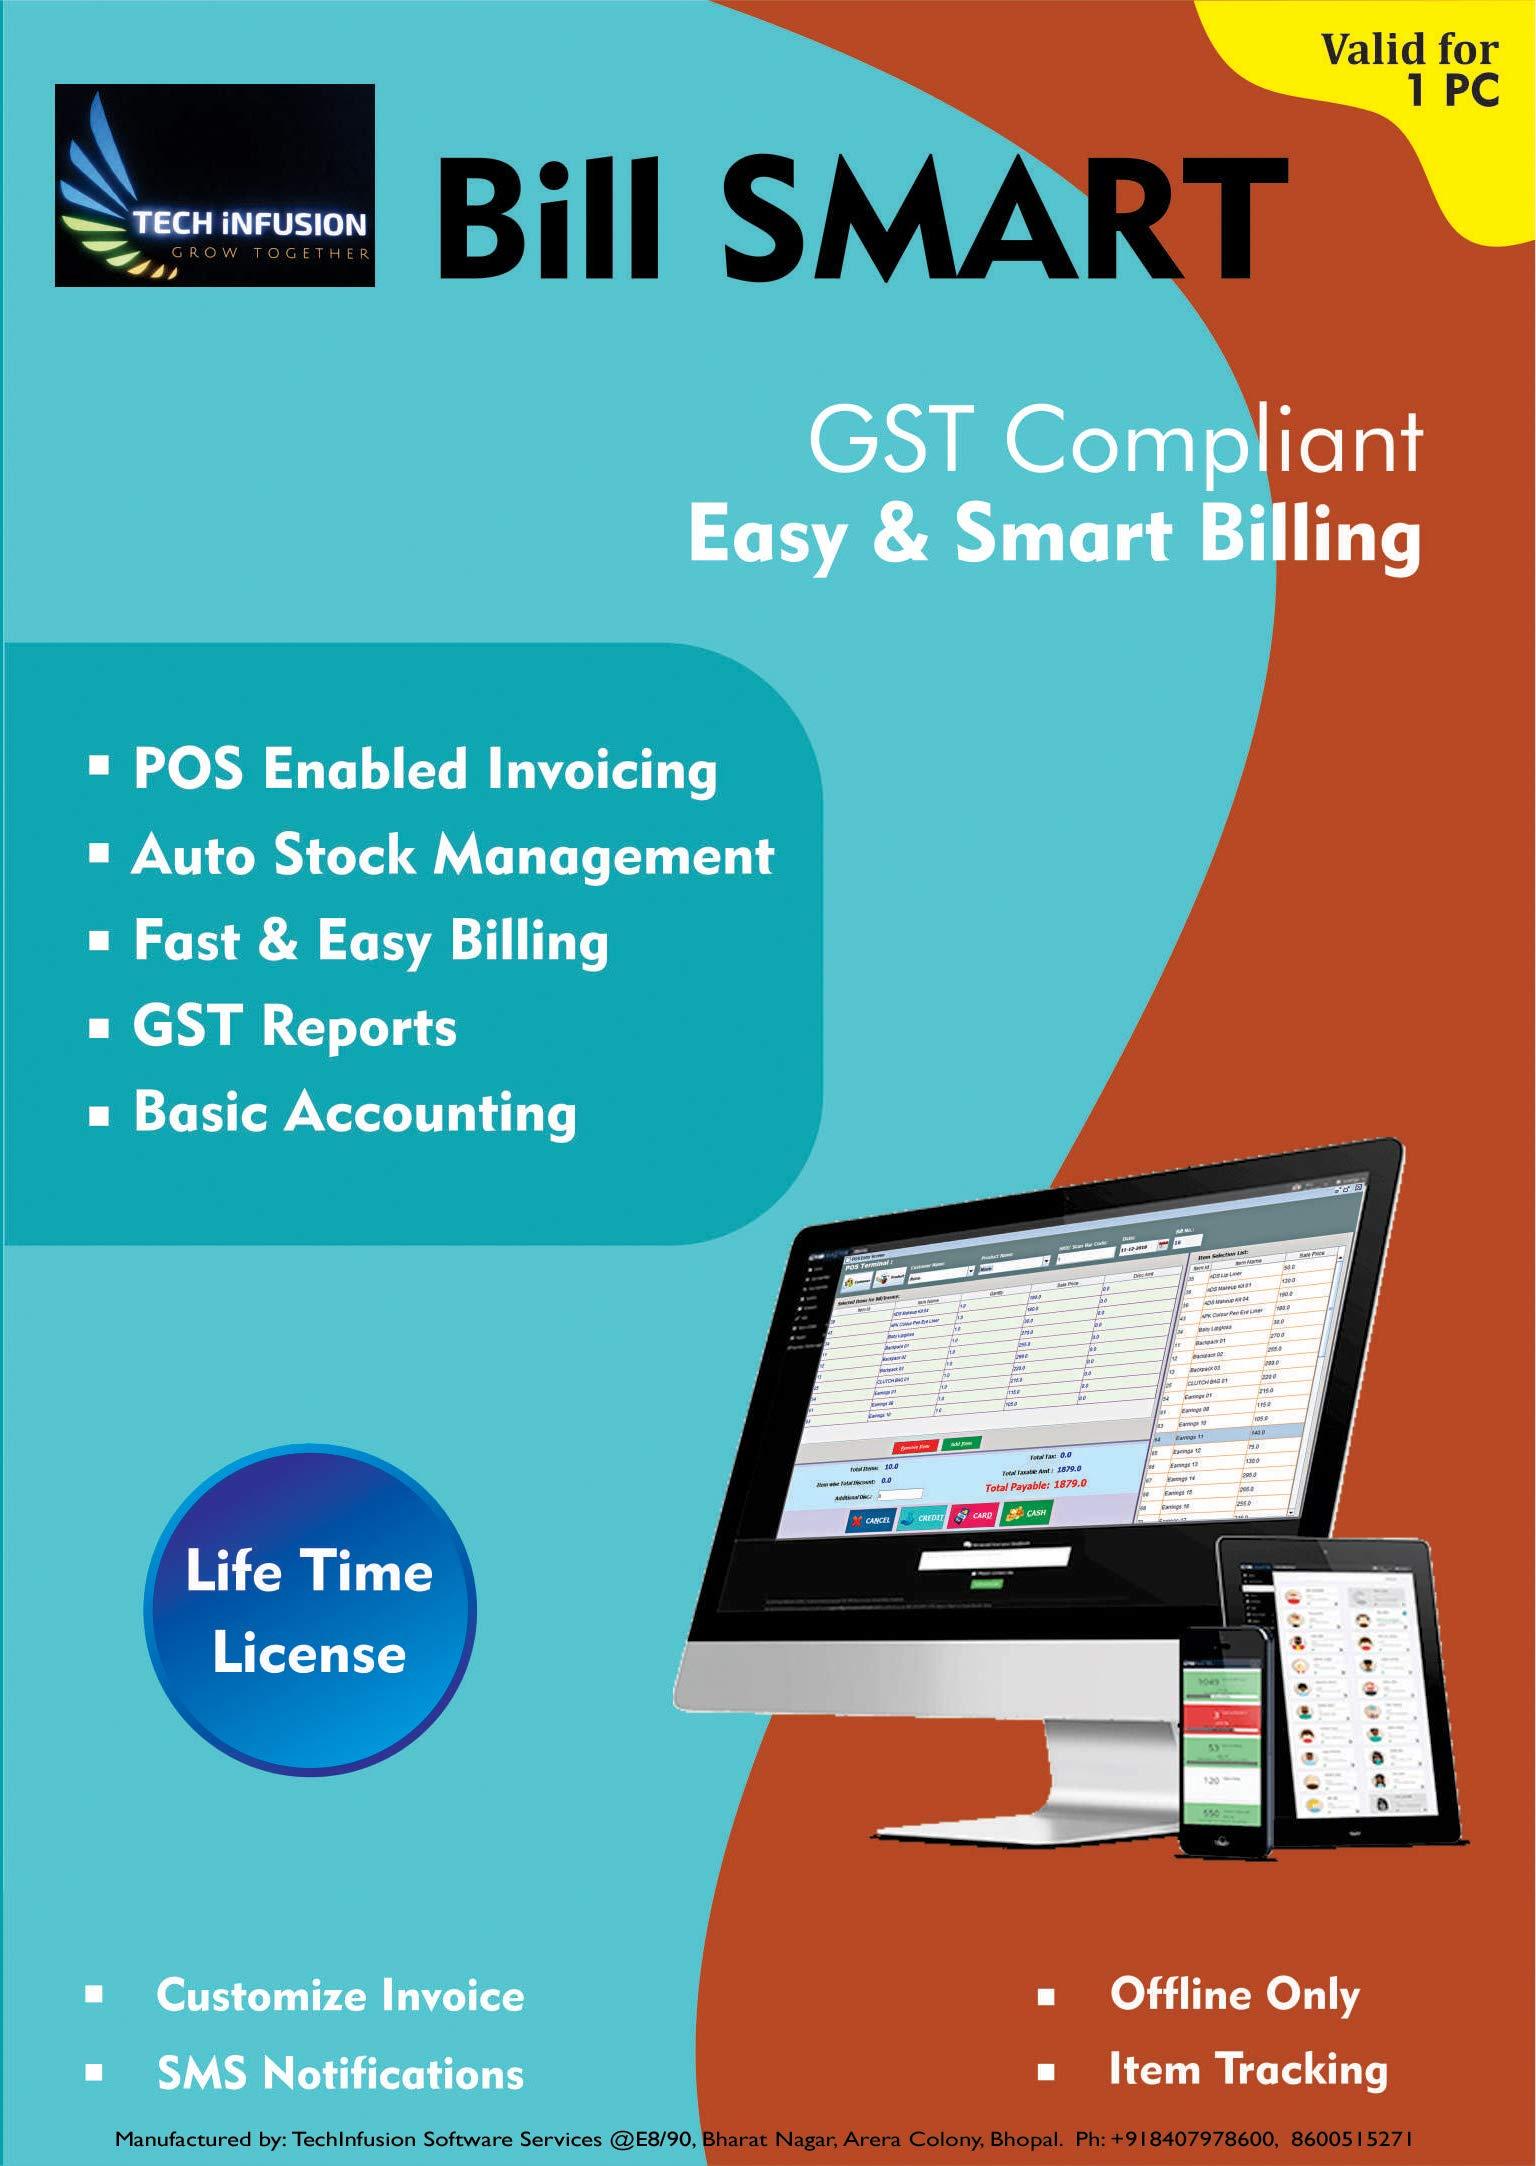 BILL SMART – GST Compliant, Billing, Invoicing, Software